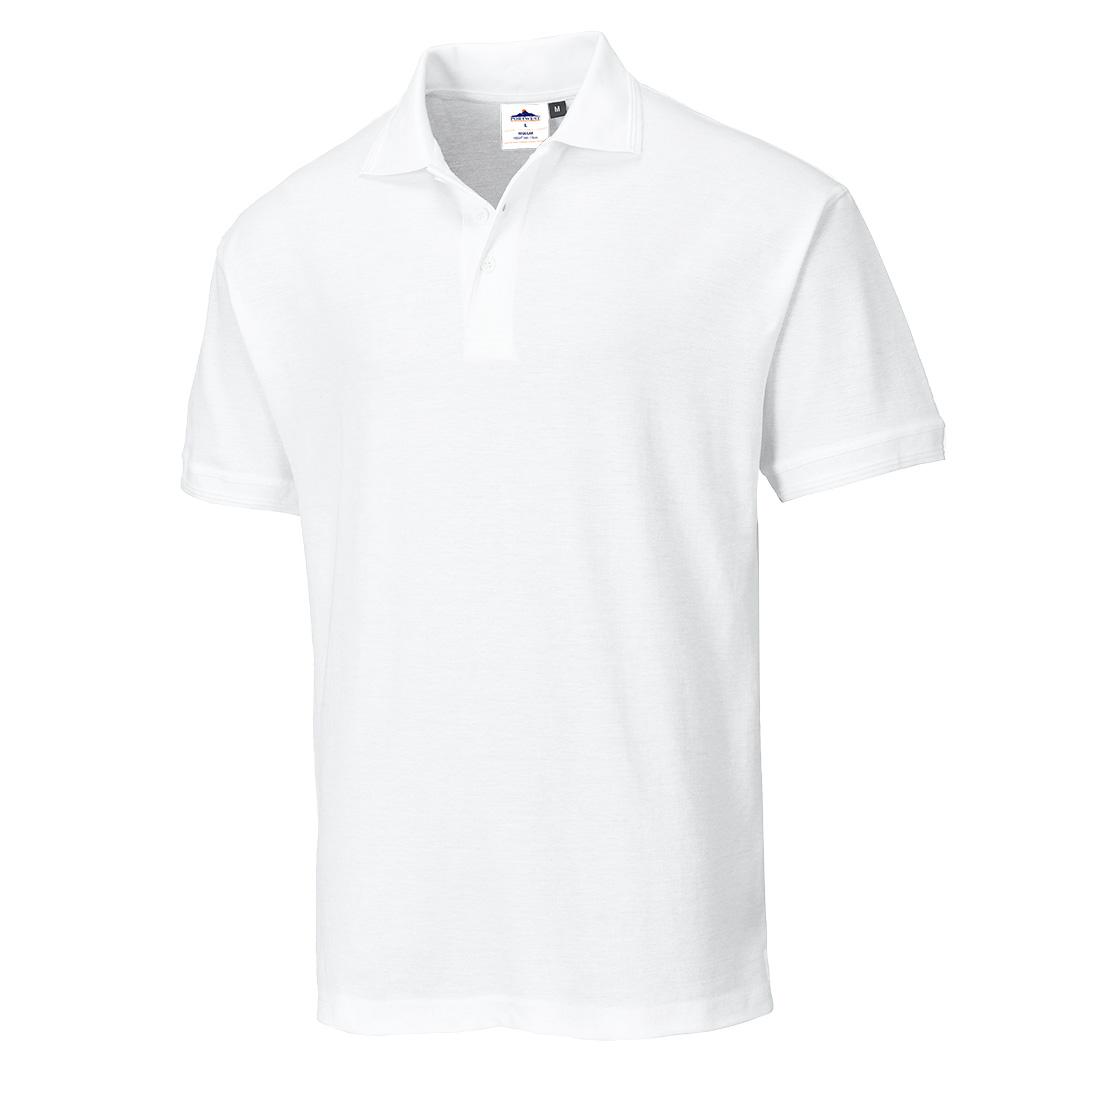 Verona Cotton Polo White MR